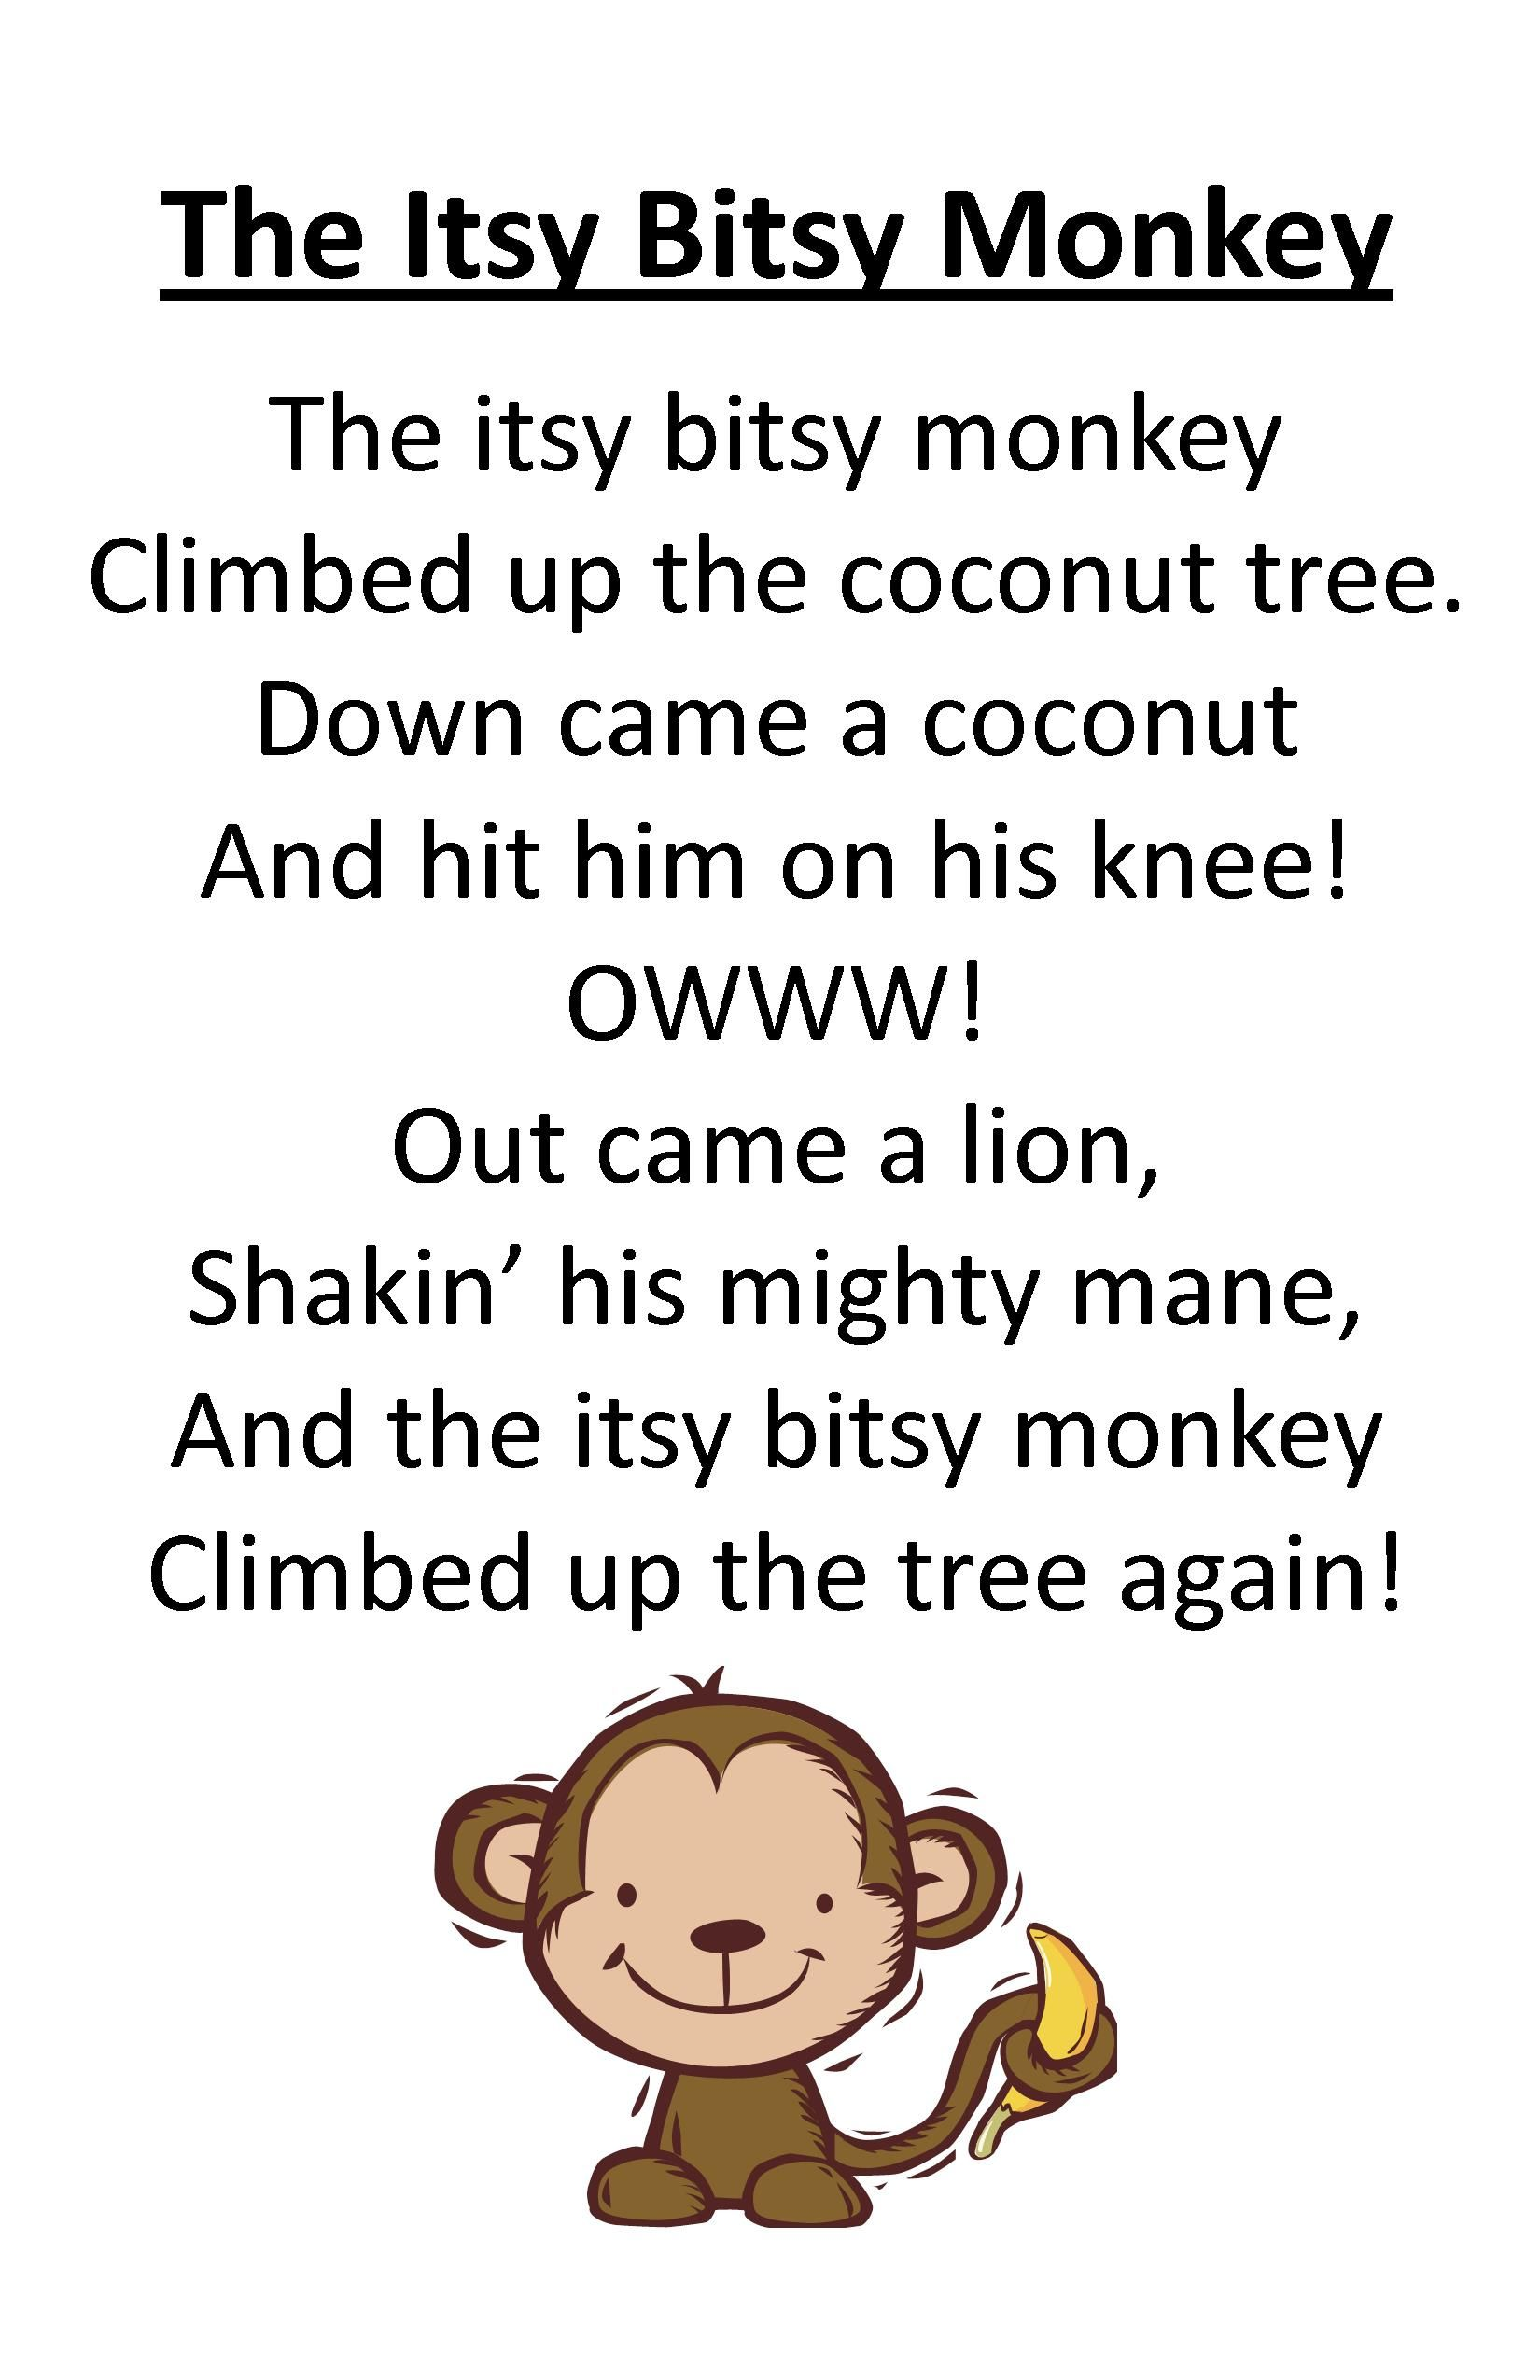 Itty Bitty Rhyme The Itsy Bitsy Monkey Preschool songs